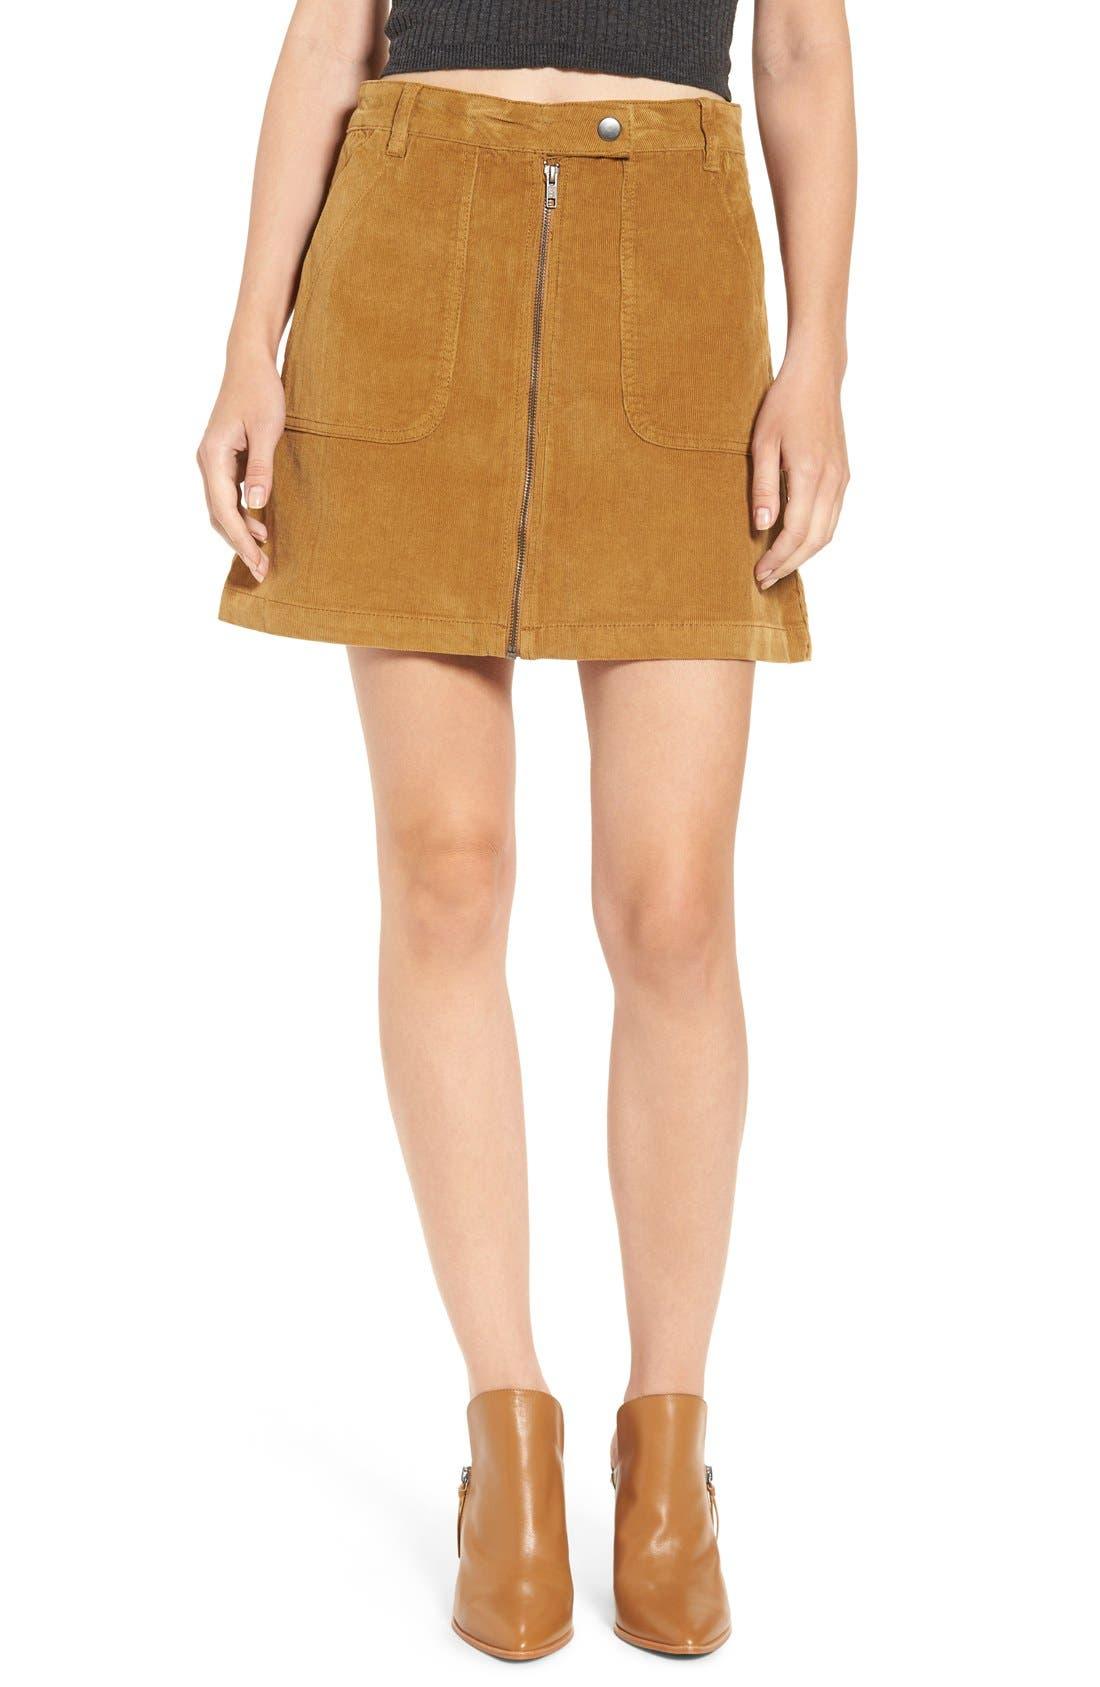 Alternate Image 1 Selected - BP. A-Line Corduroy Skirt